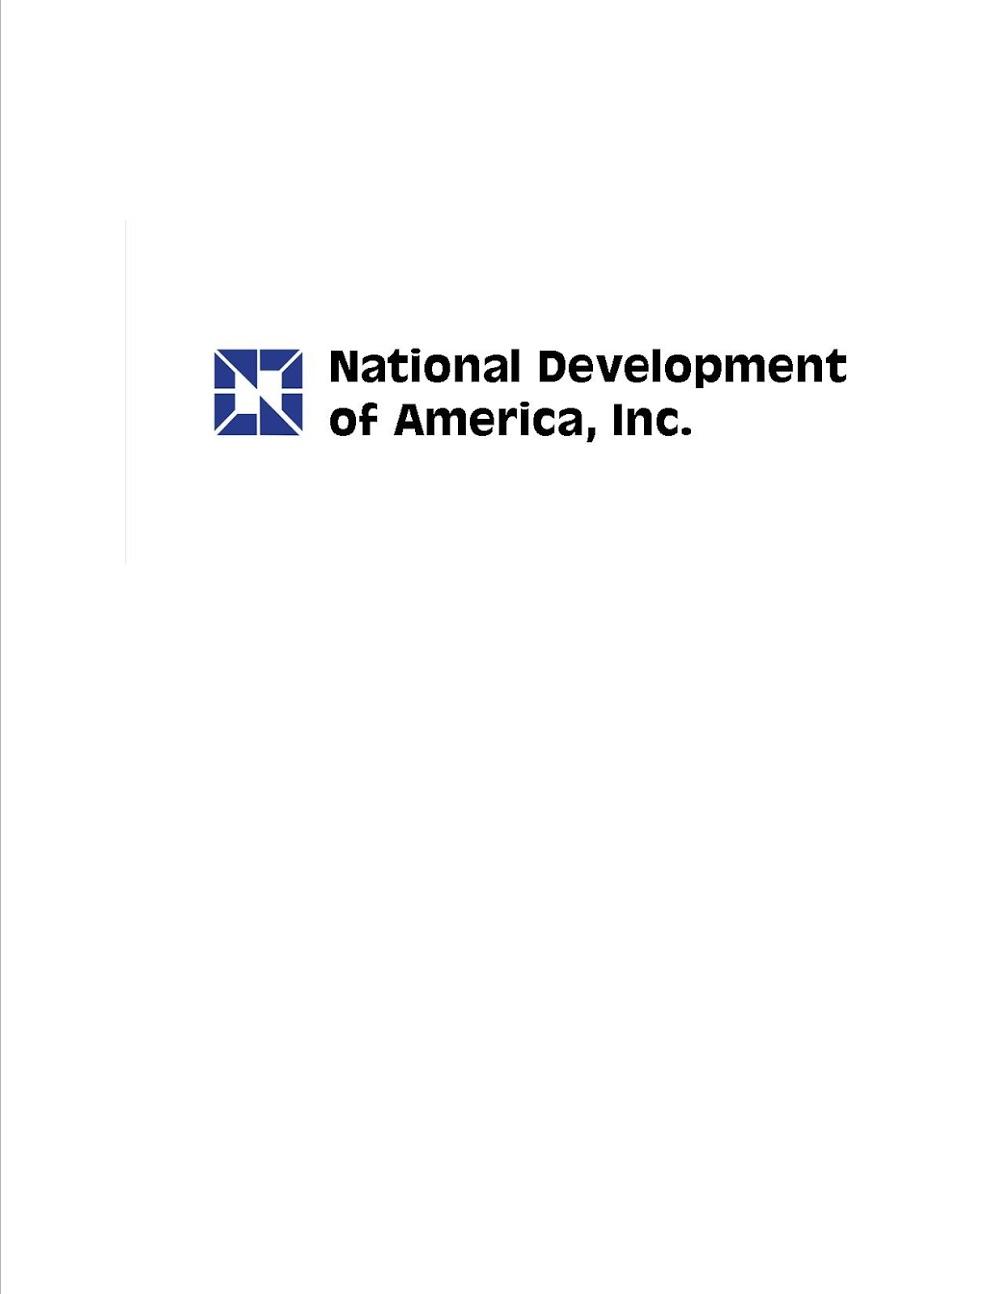 National Development of America, Inc.